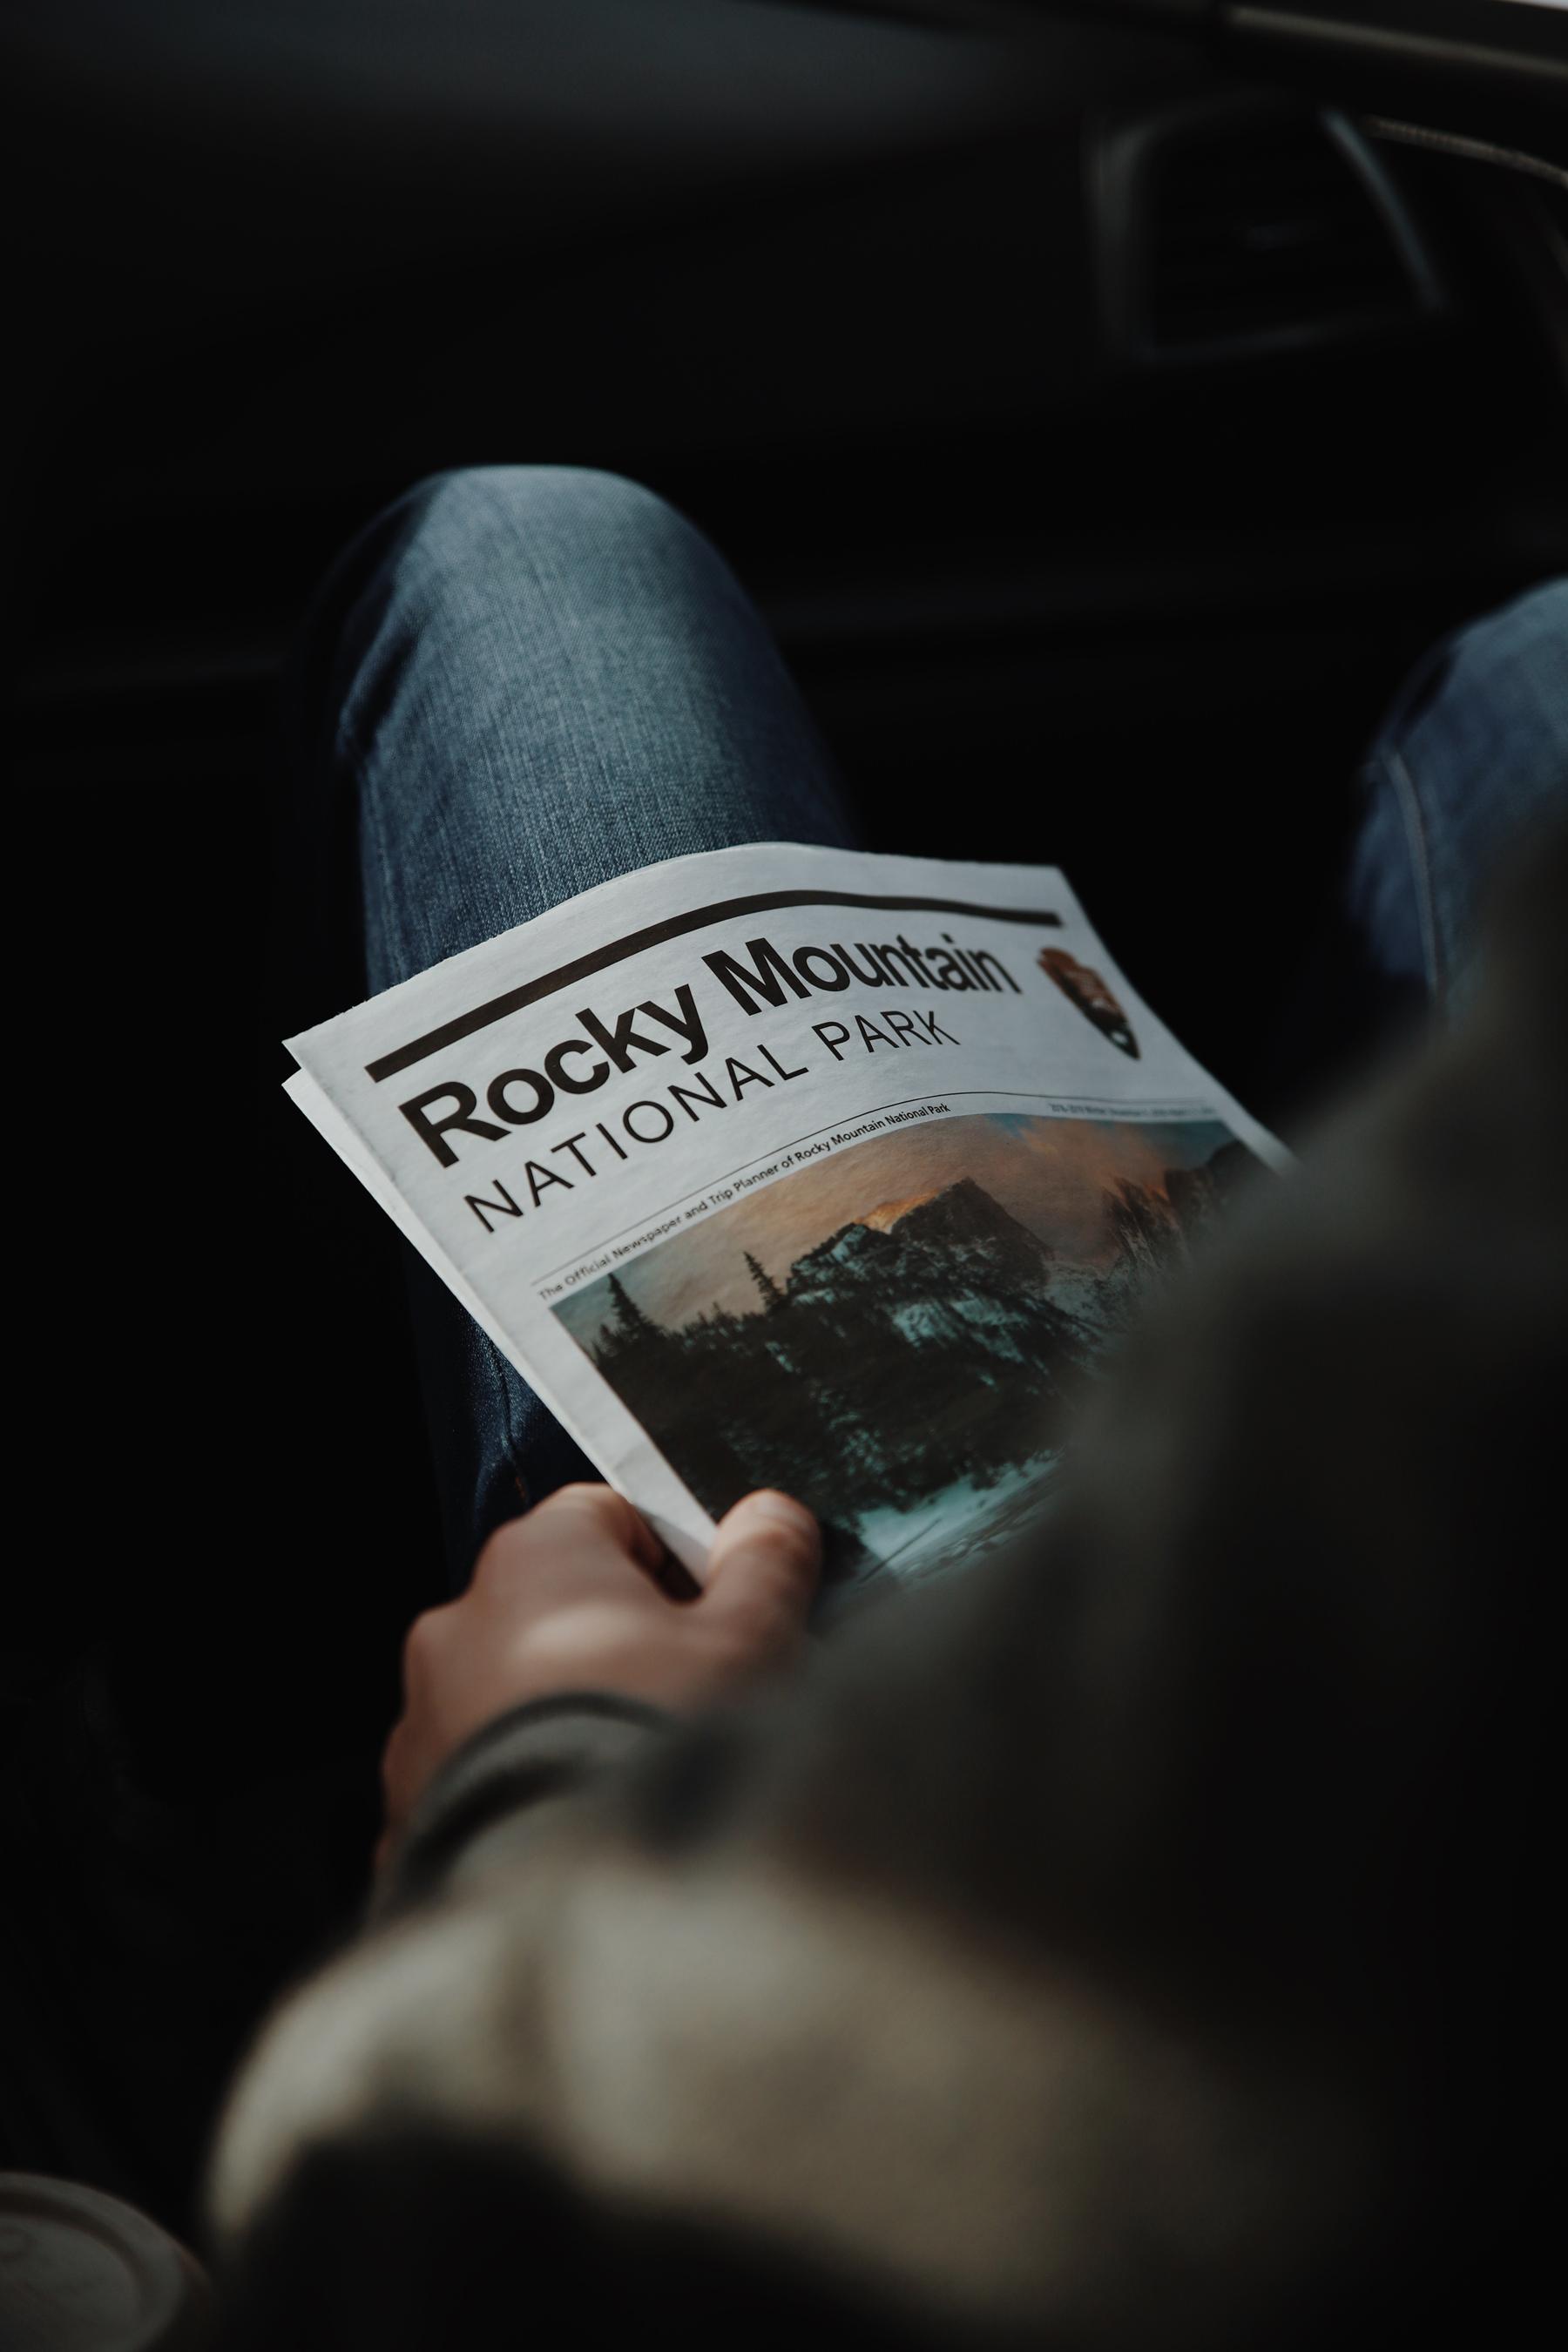 Rockymountainnationalpark.JPG